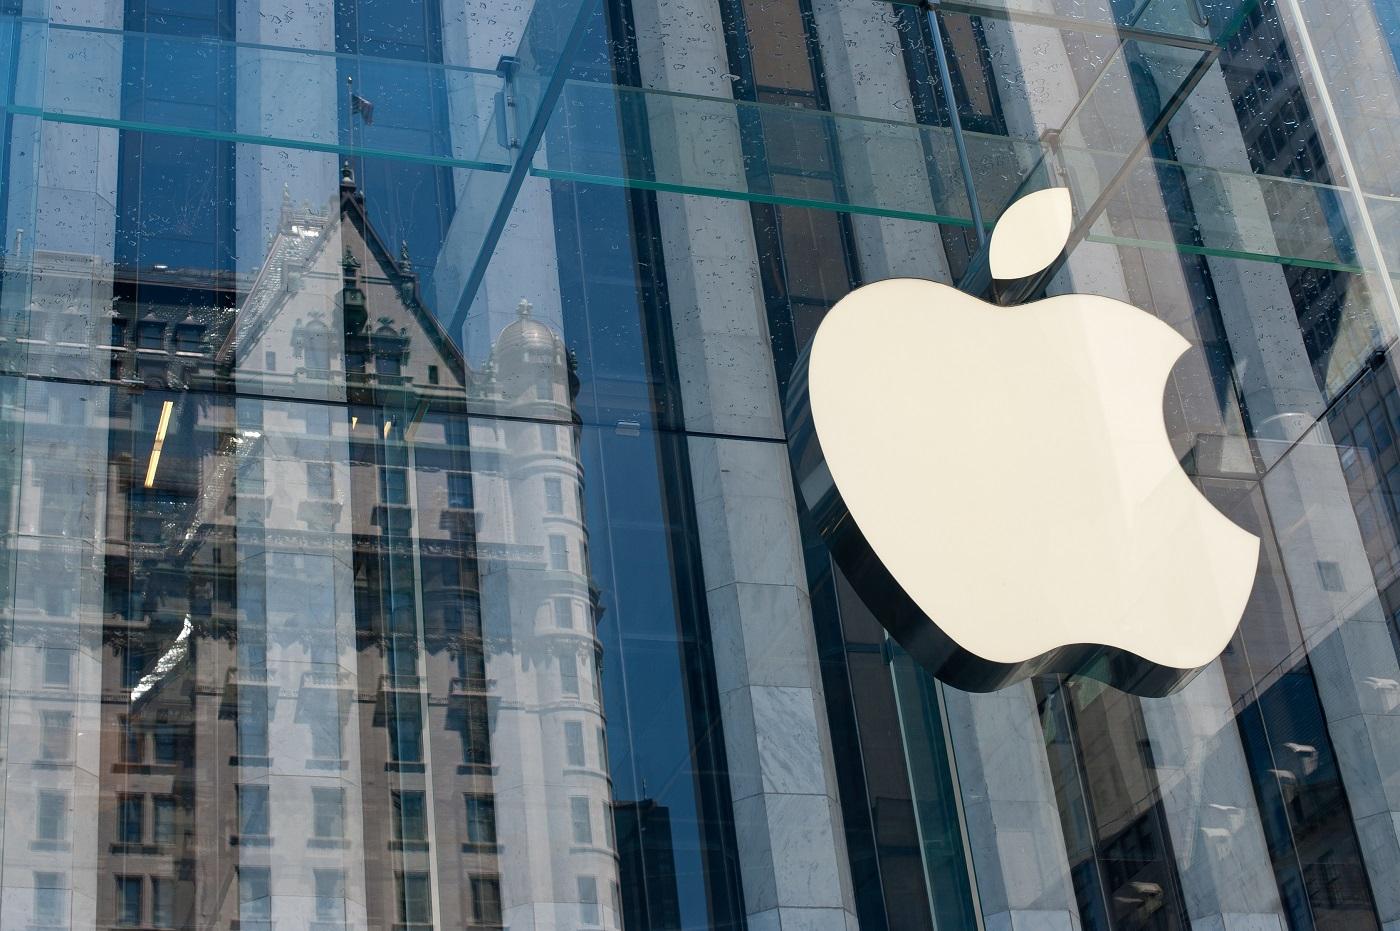 shutterstock_apple store new york usa